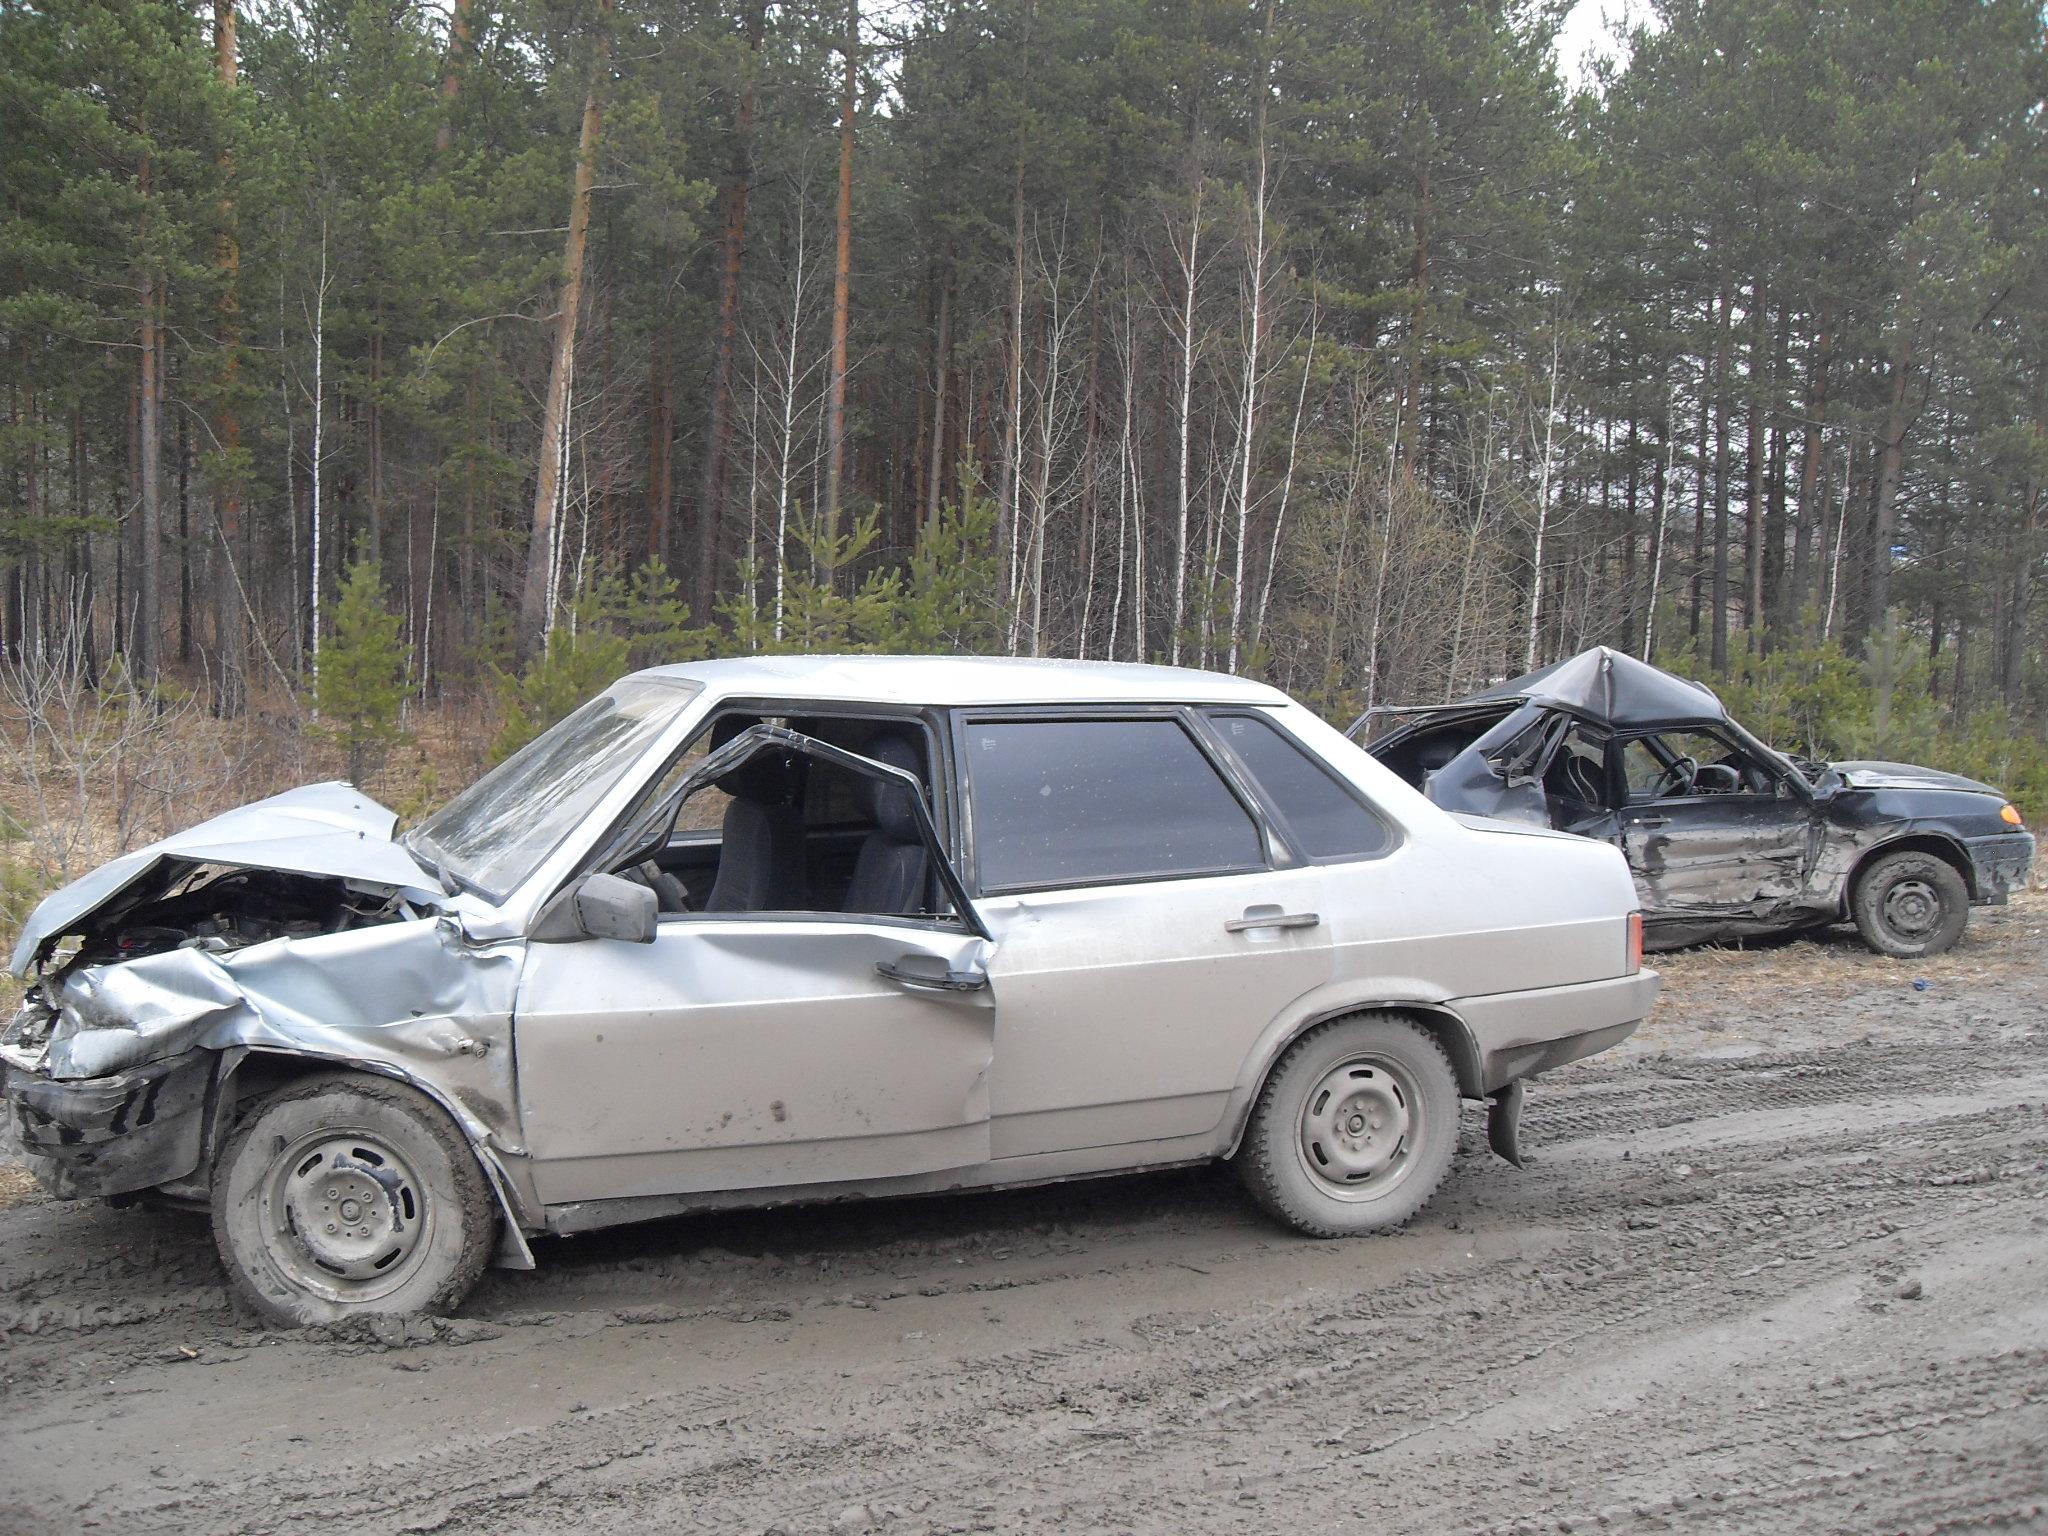 Женщина за рулем ВАЗ-21140 устроила ДТП на ЕКАД — двое госпитализированы